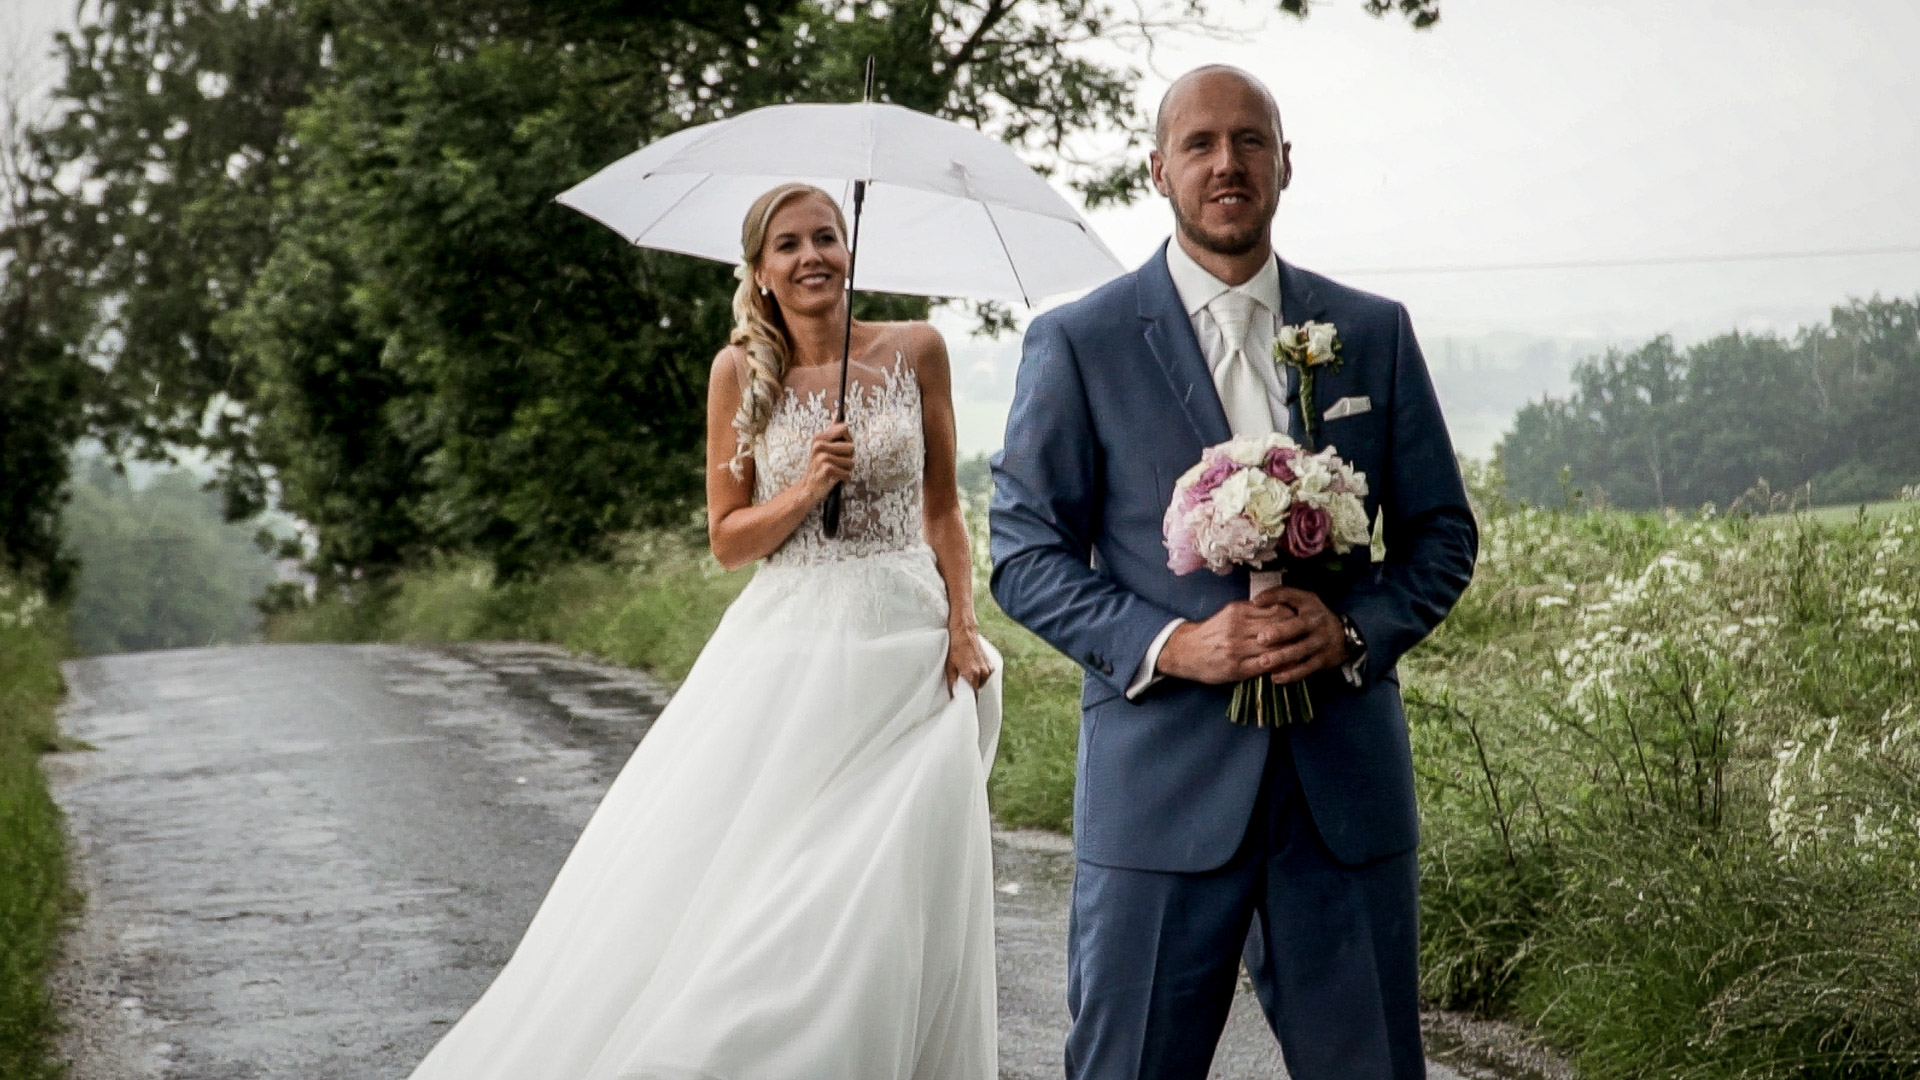 Veselá svatba v dešti u Havlíčkova Brodu na statku u Kulaka